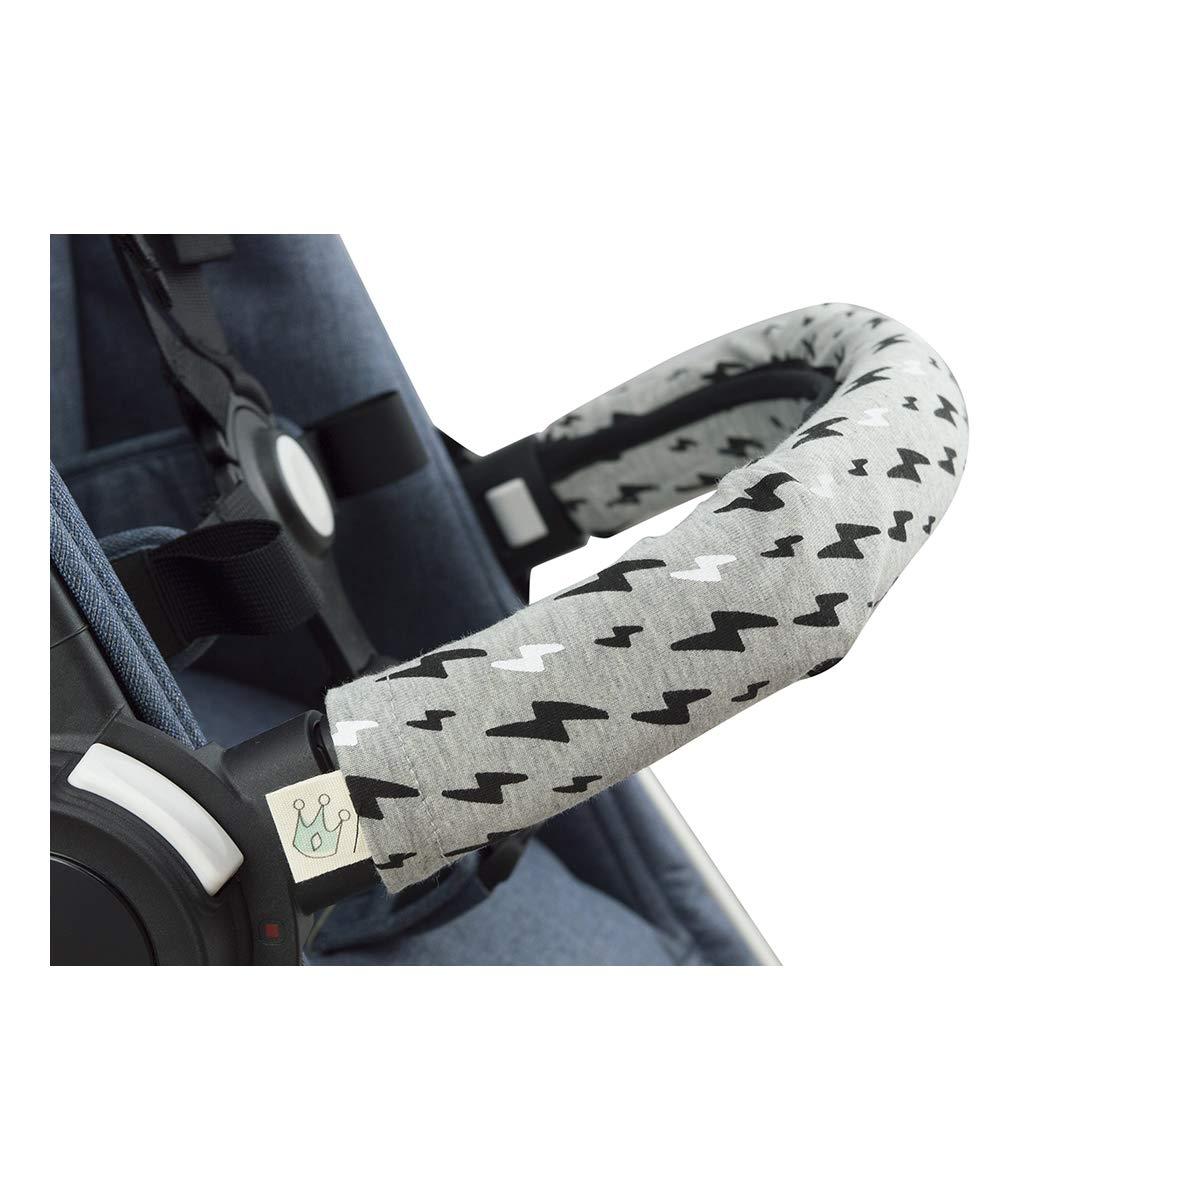 JANABEBE Covers Handle, Covers Railing for Stroller (Black Rayo, Regular)